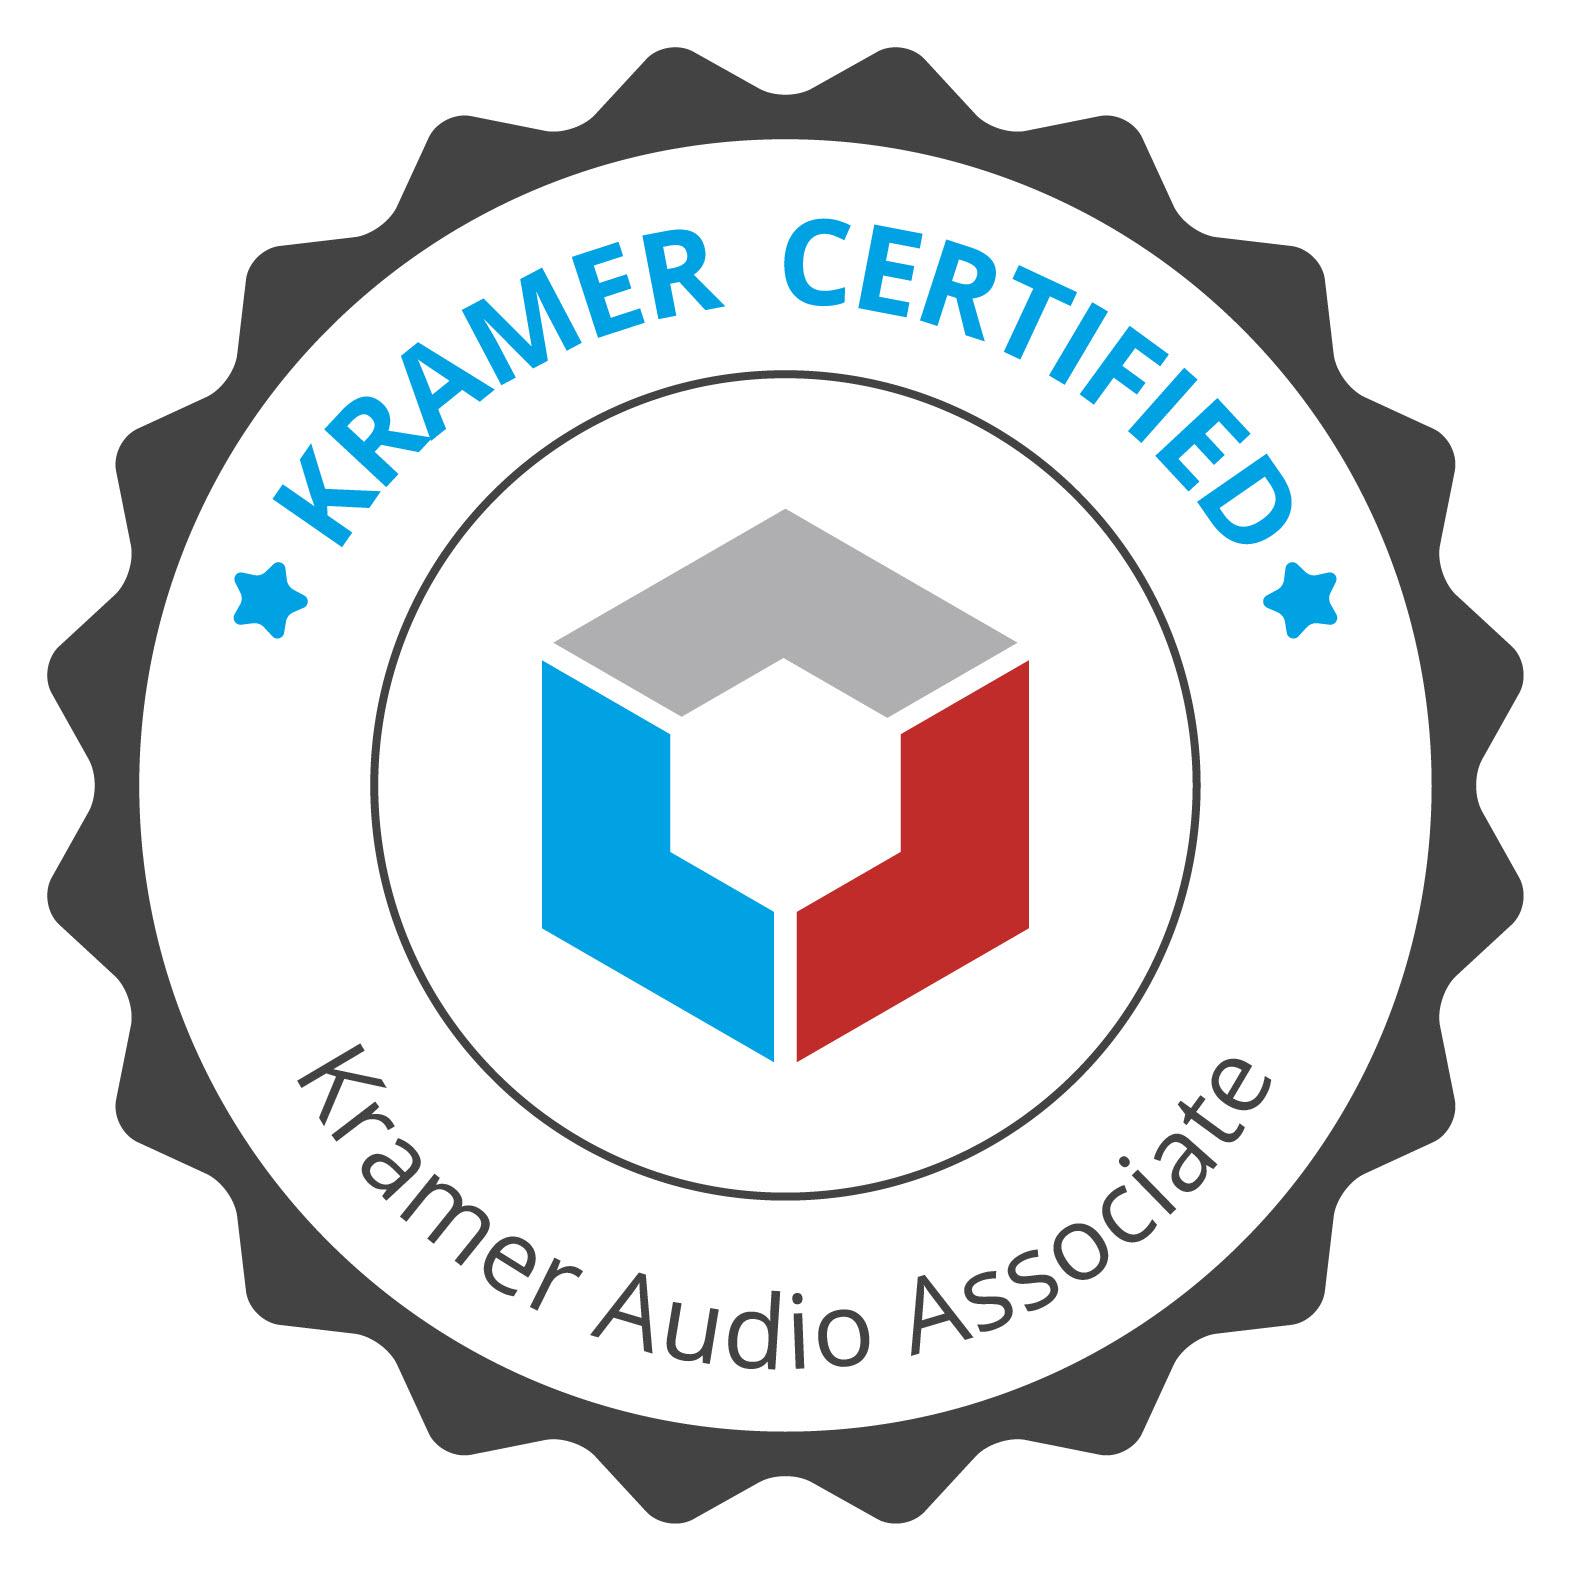 Audio Basics 101: The key certification for basic Audio knowledge